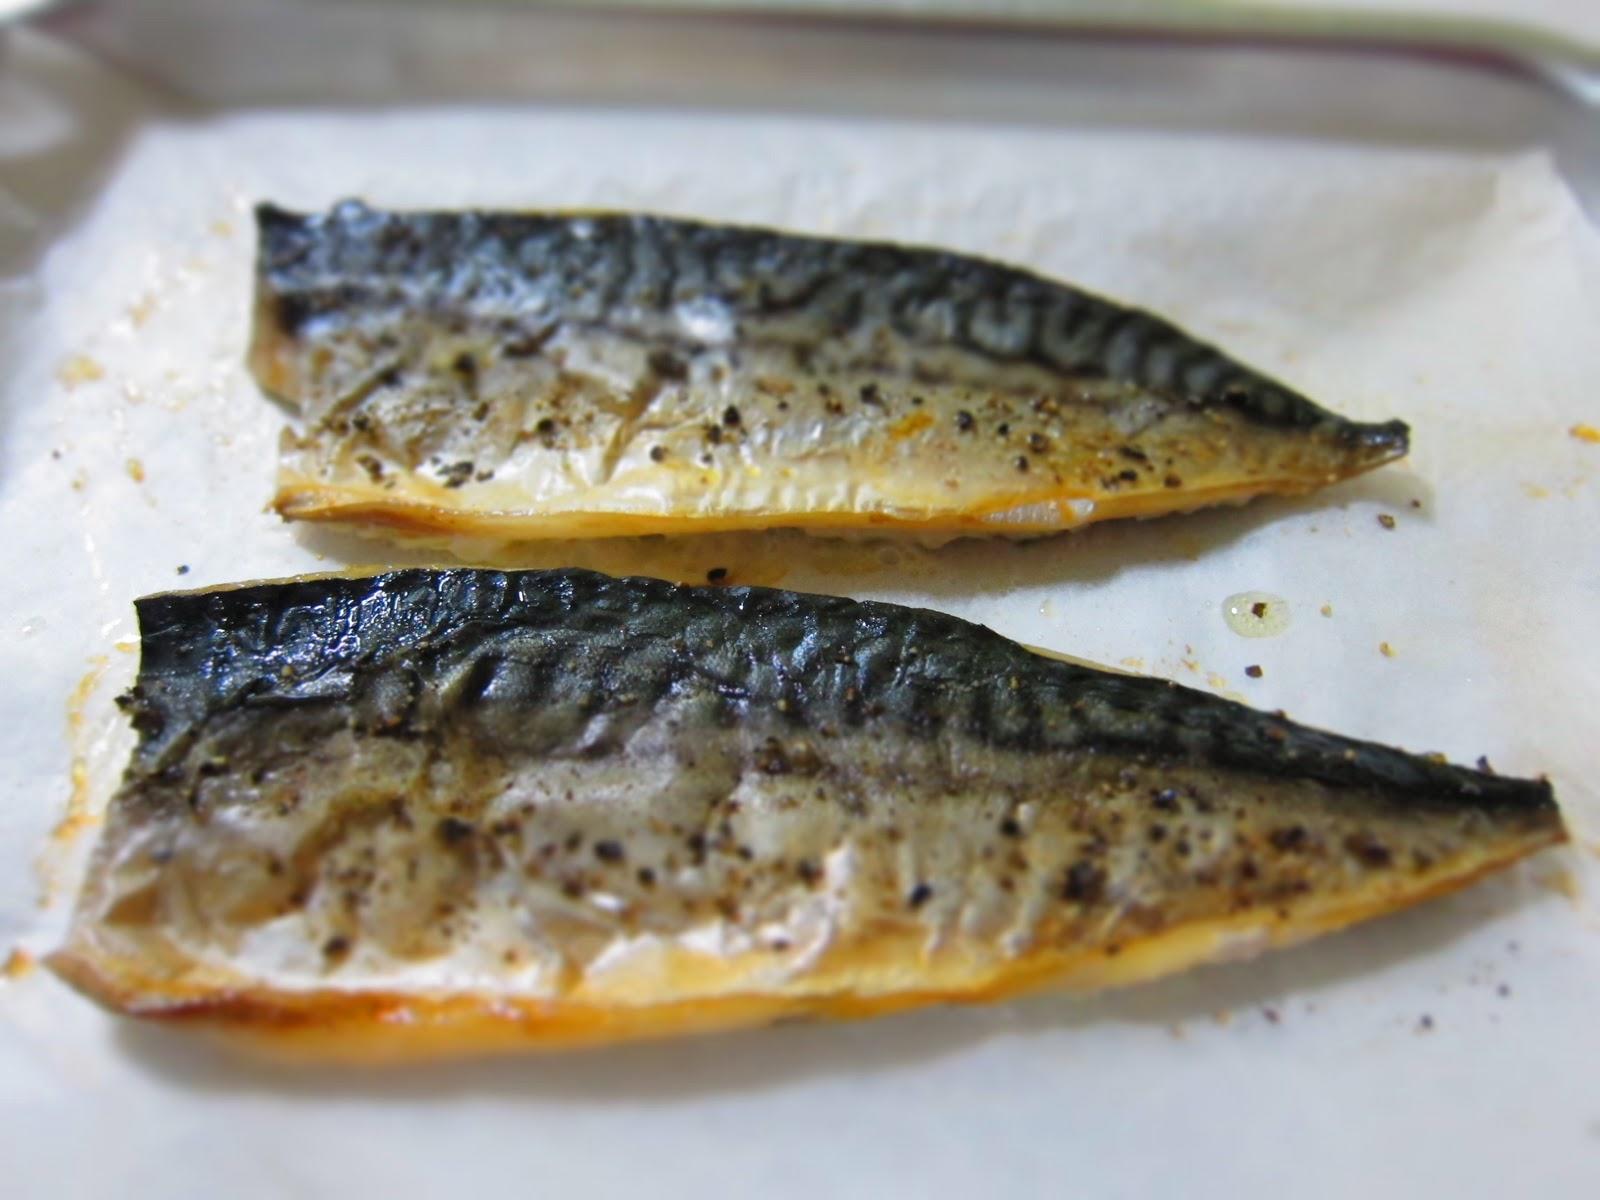 Papacheong 39 s bake saba spanish mackerel for How to cook mackerel fish